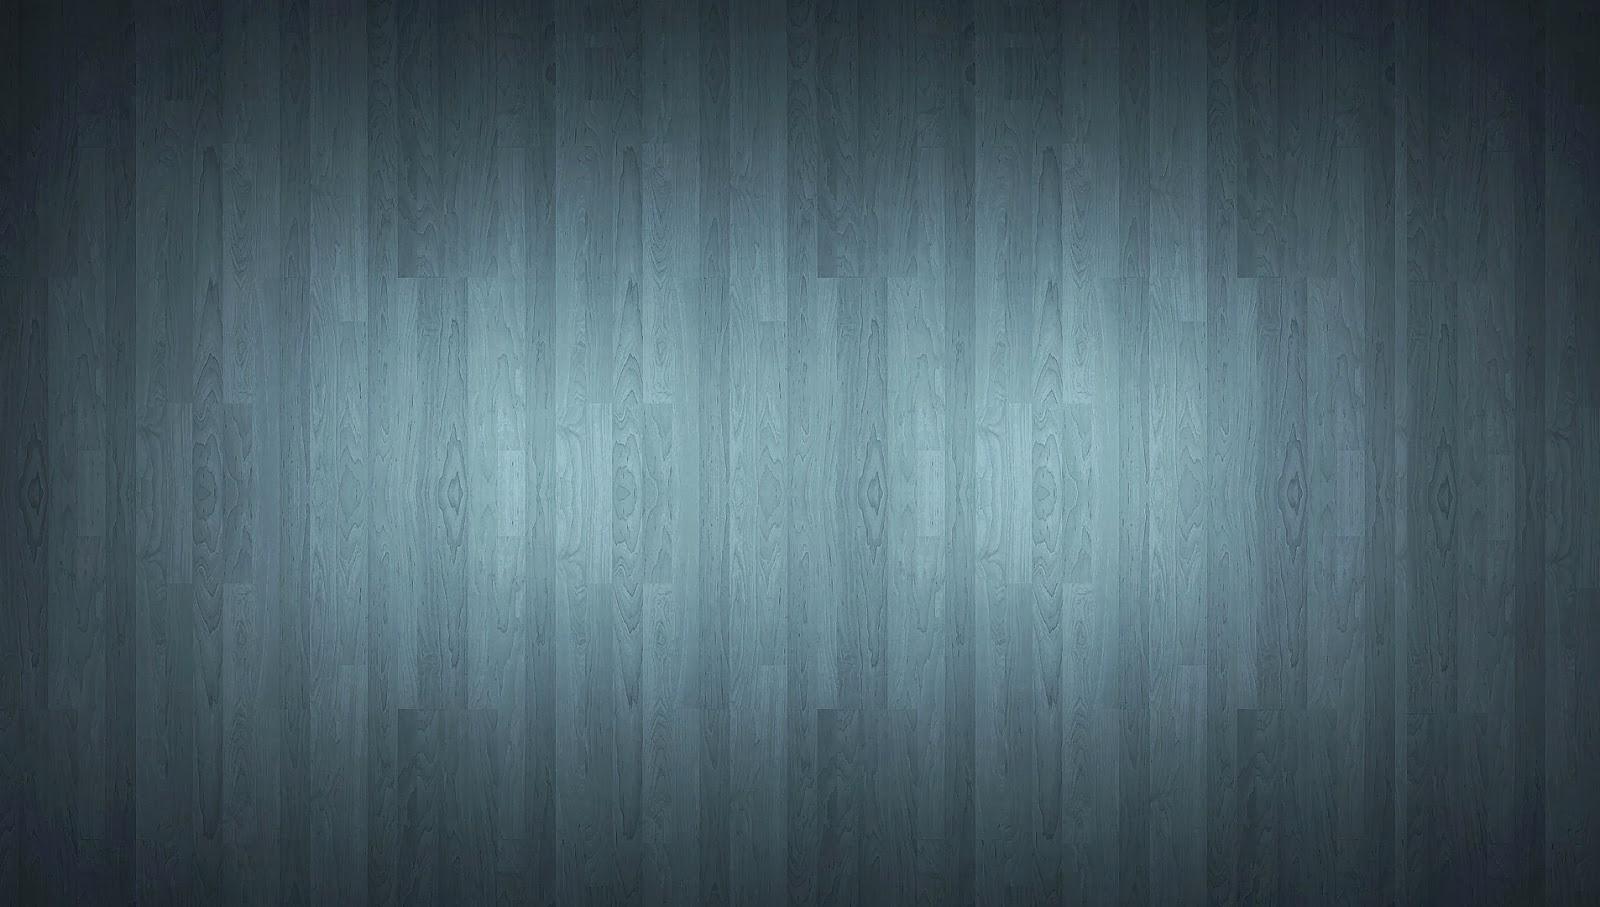 Cute Fairy Wallpaper 3d Blank Hd Wallpapers Deep Hd Wallpapers For You Hd